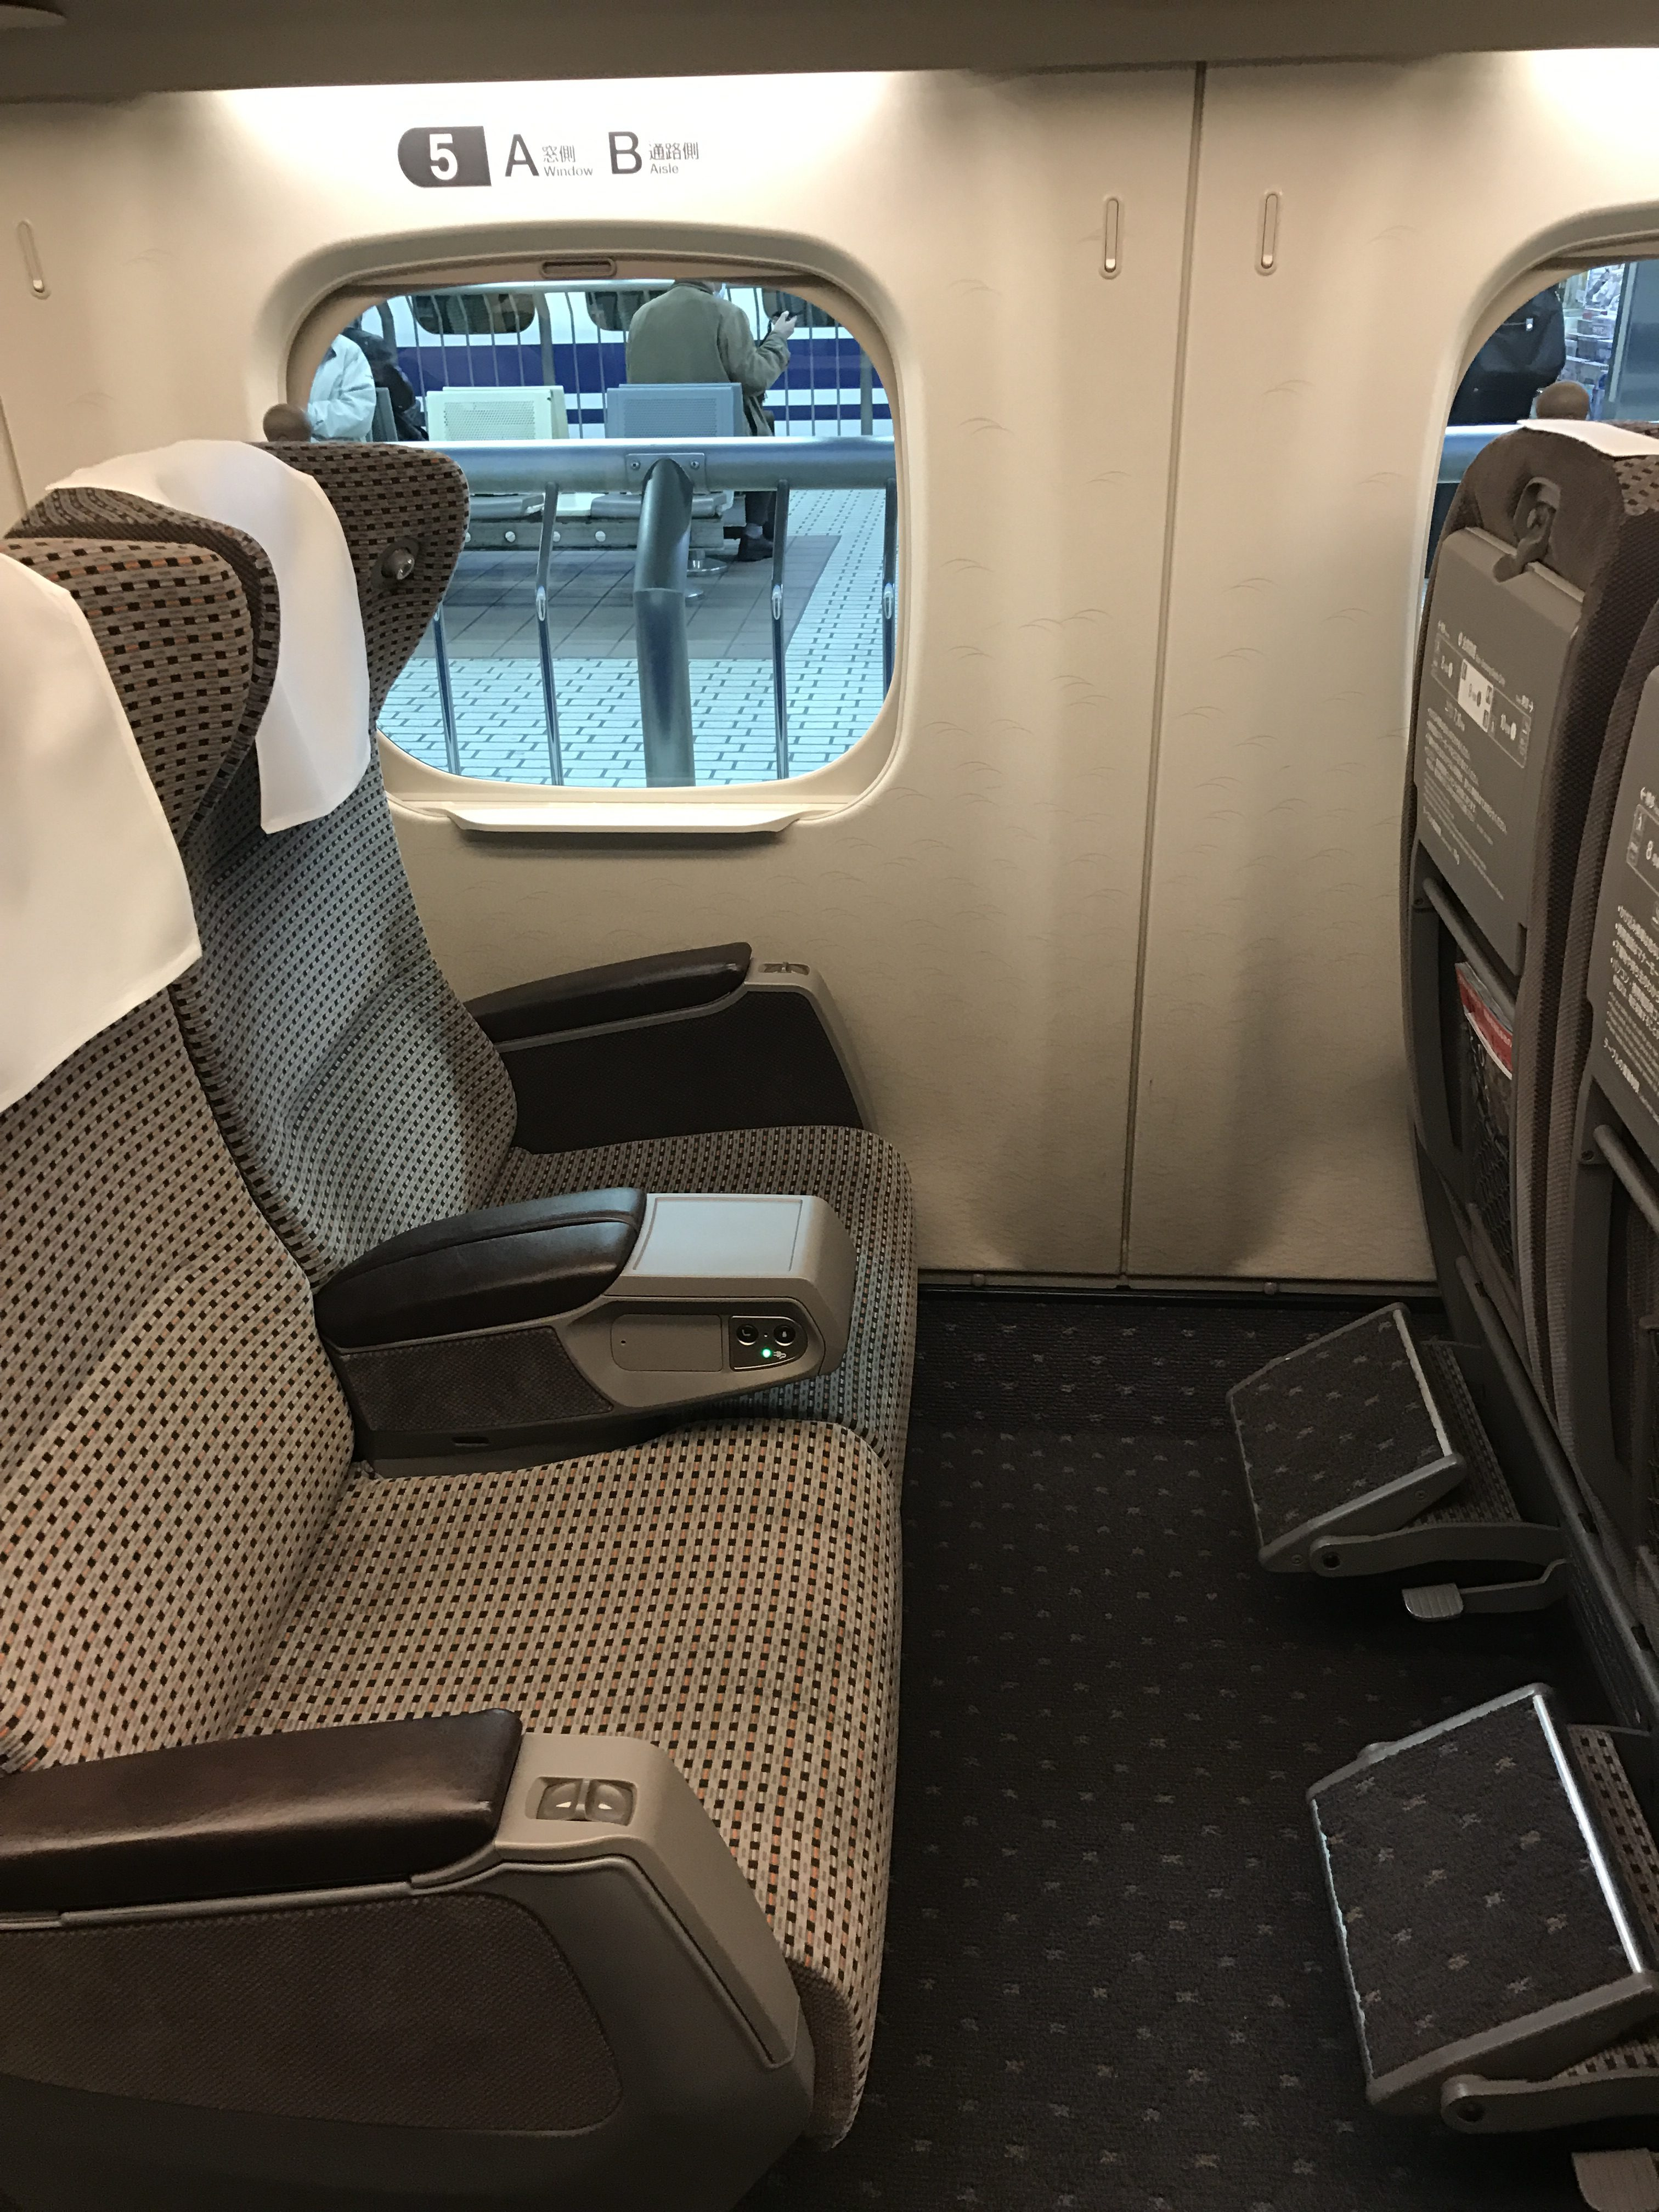 ANAのプレミアムクラスと、東海道新幹線のグリーン車を比較してみる